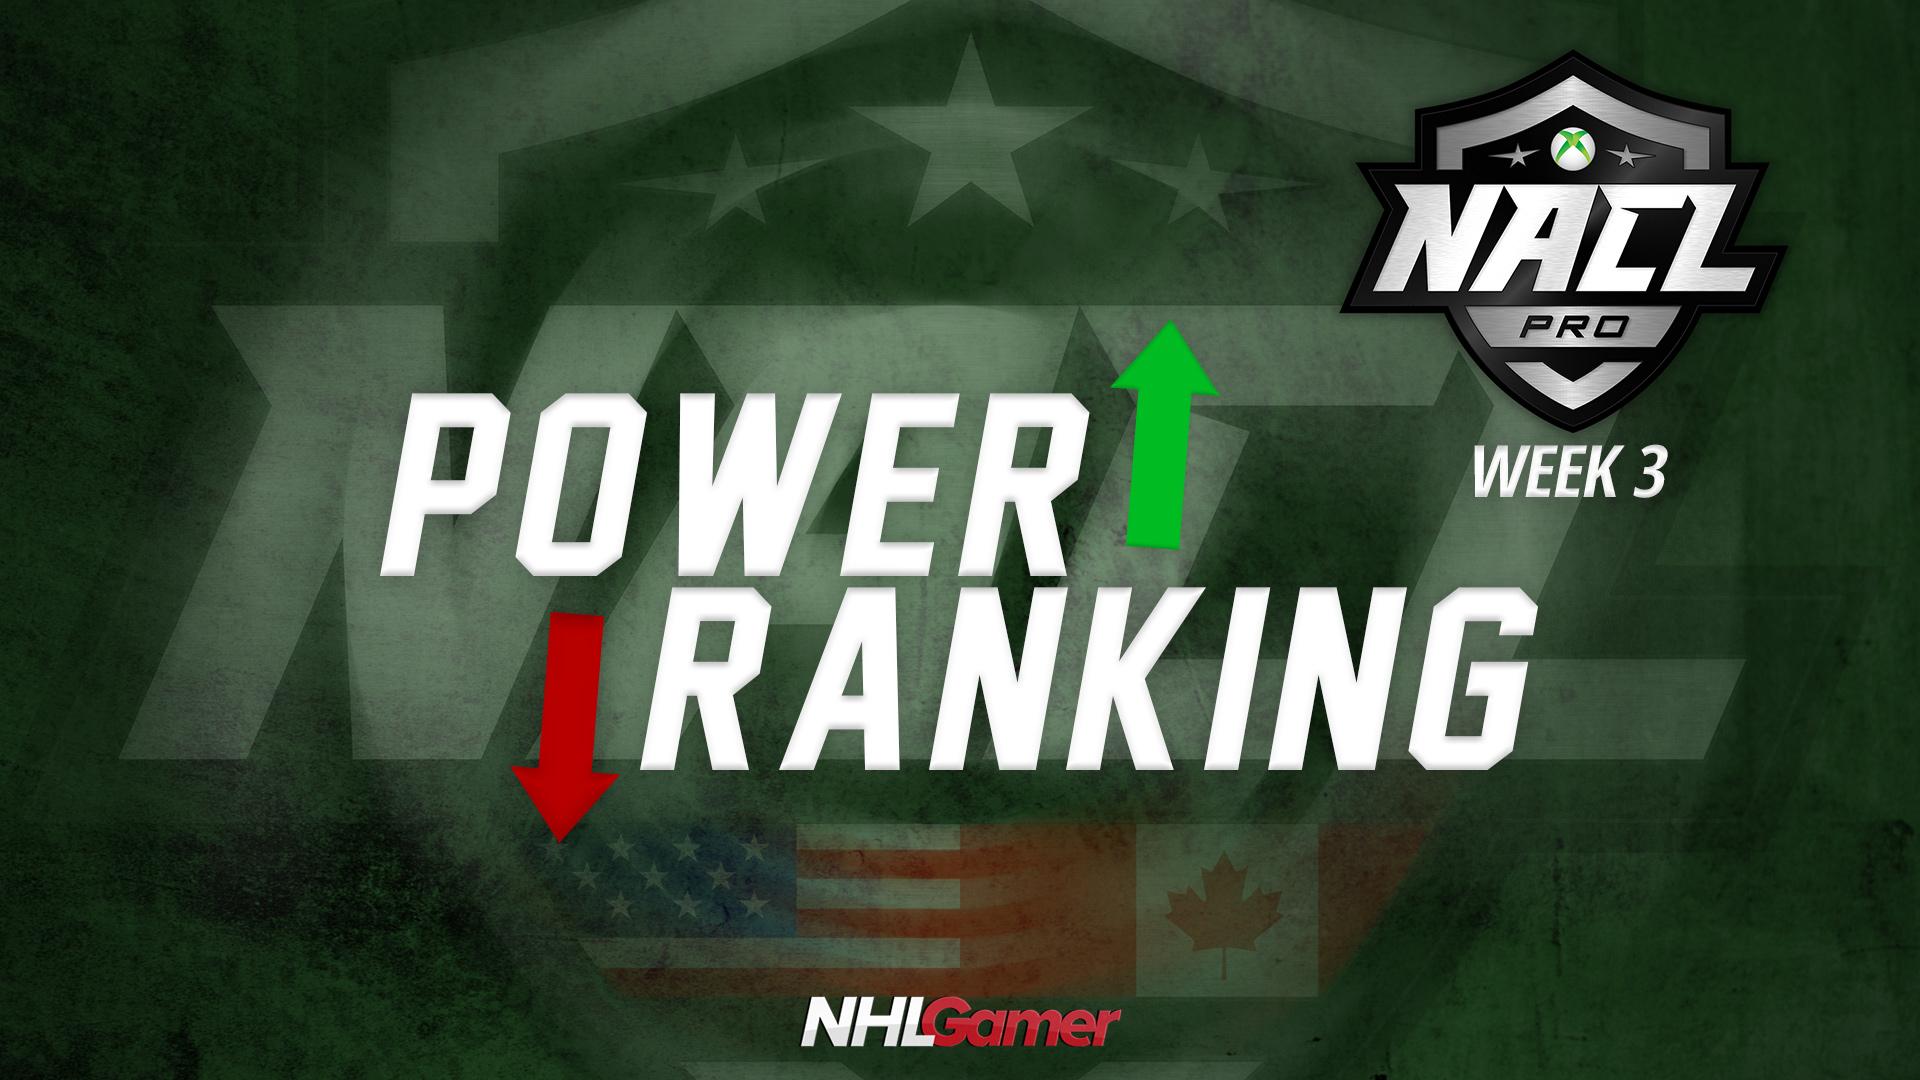 Xbox_NACL_Pro_Power_Ranking_Week_3.jpg